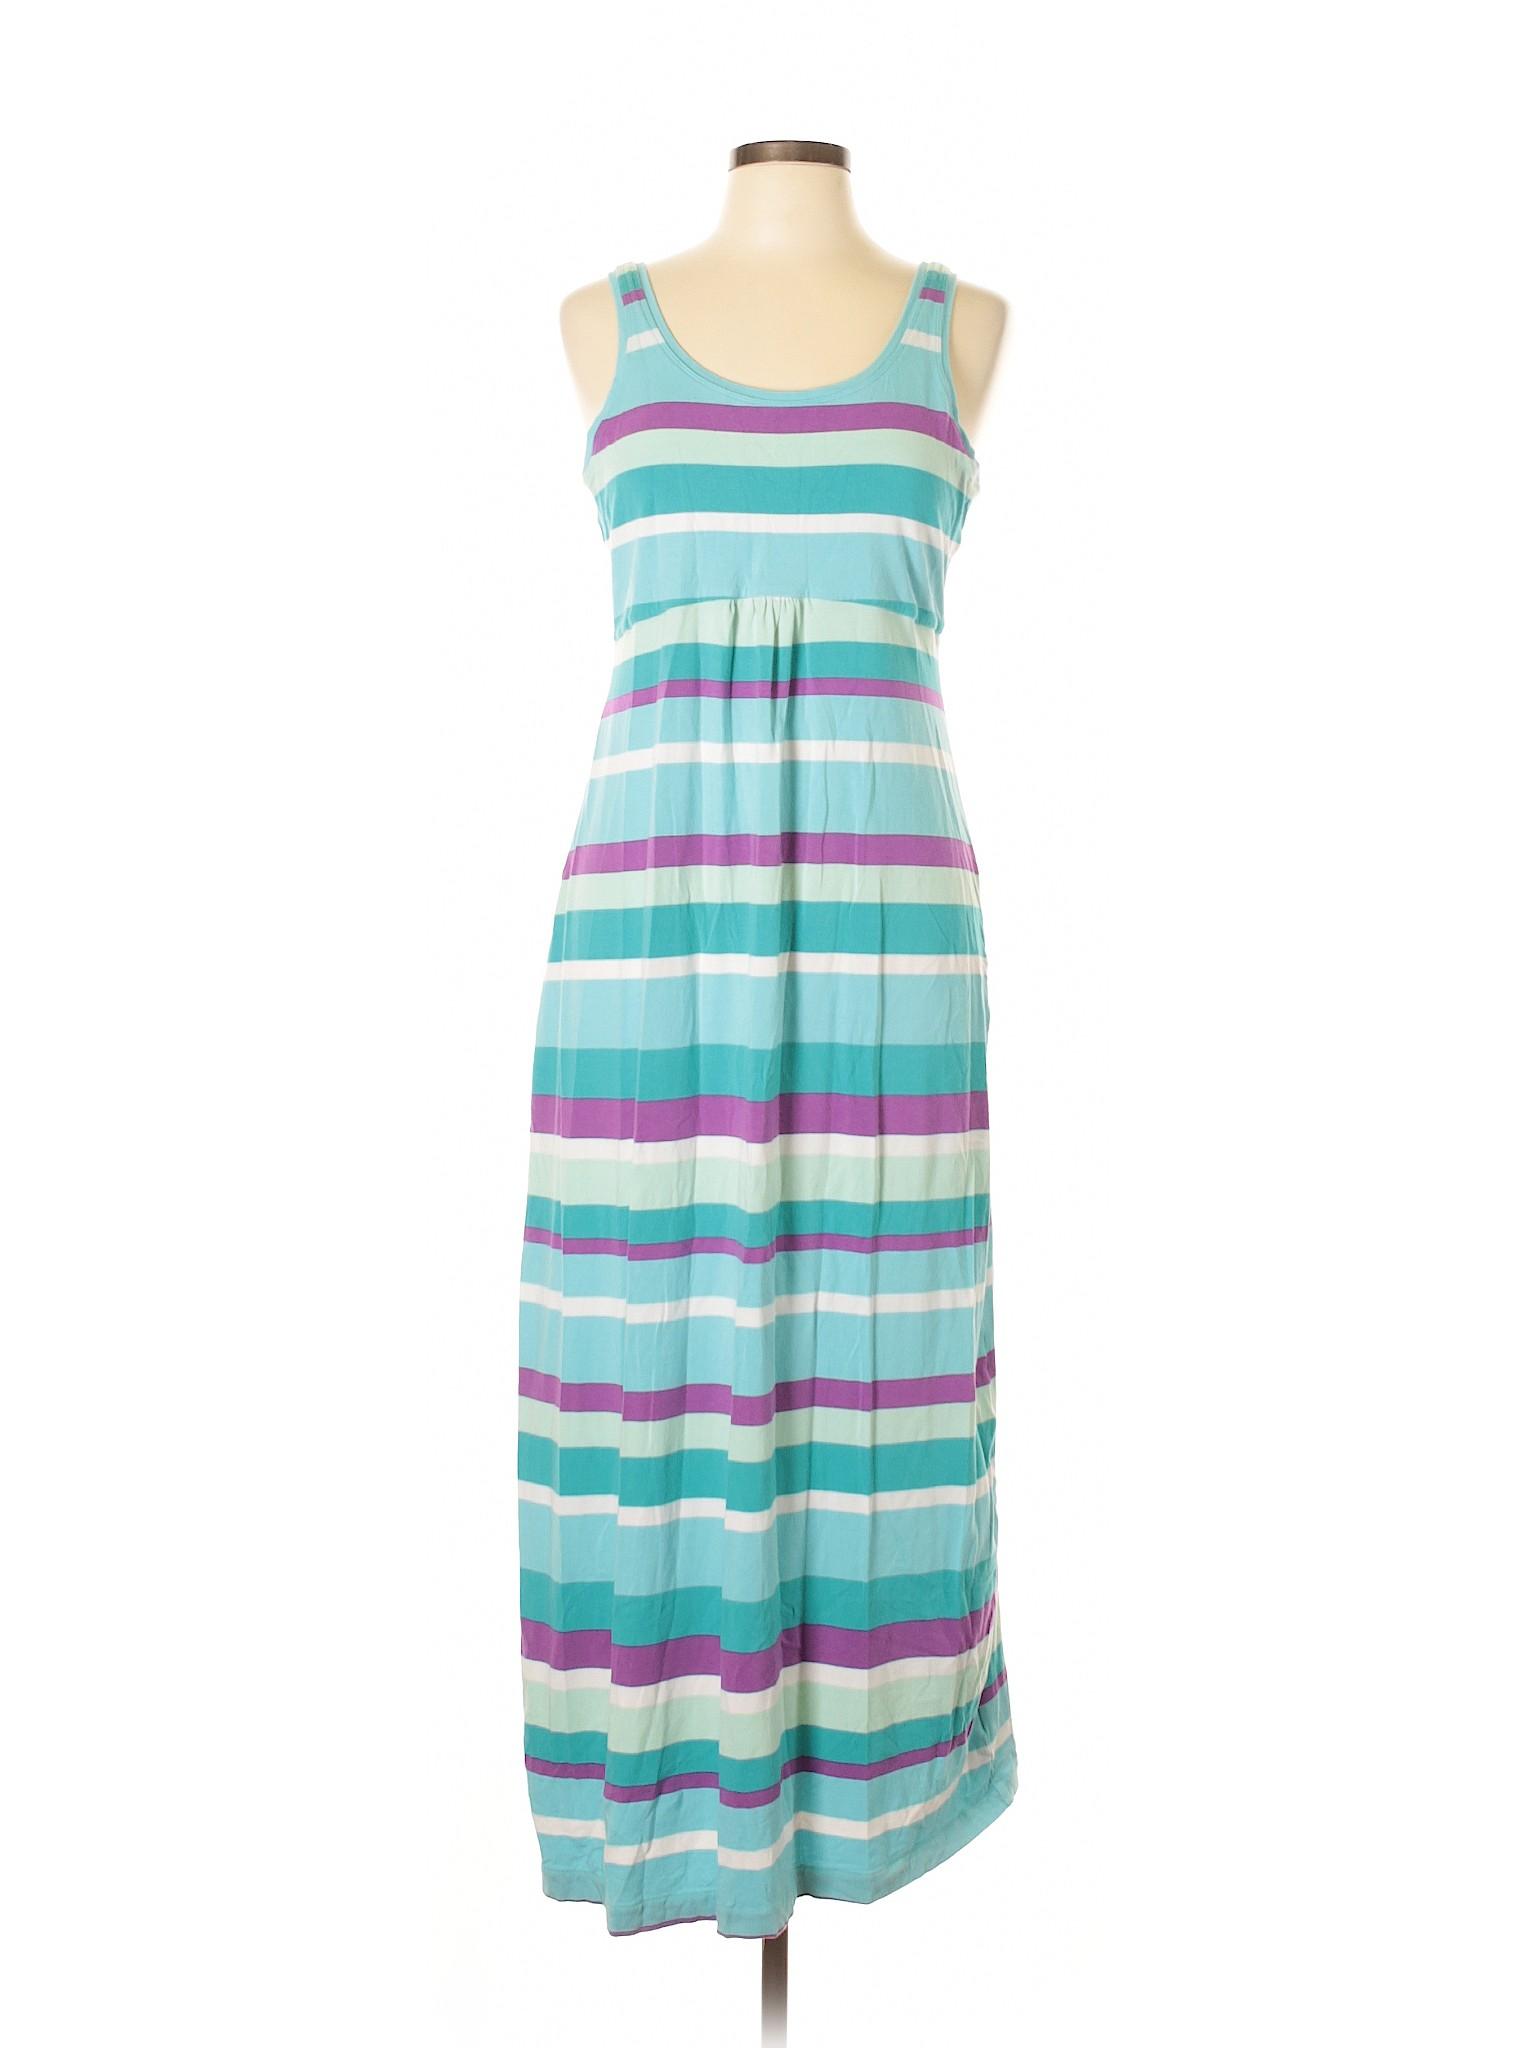 Casual Columbia Selling Selling Dress Columbia Casual Dress OWXF7xq